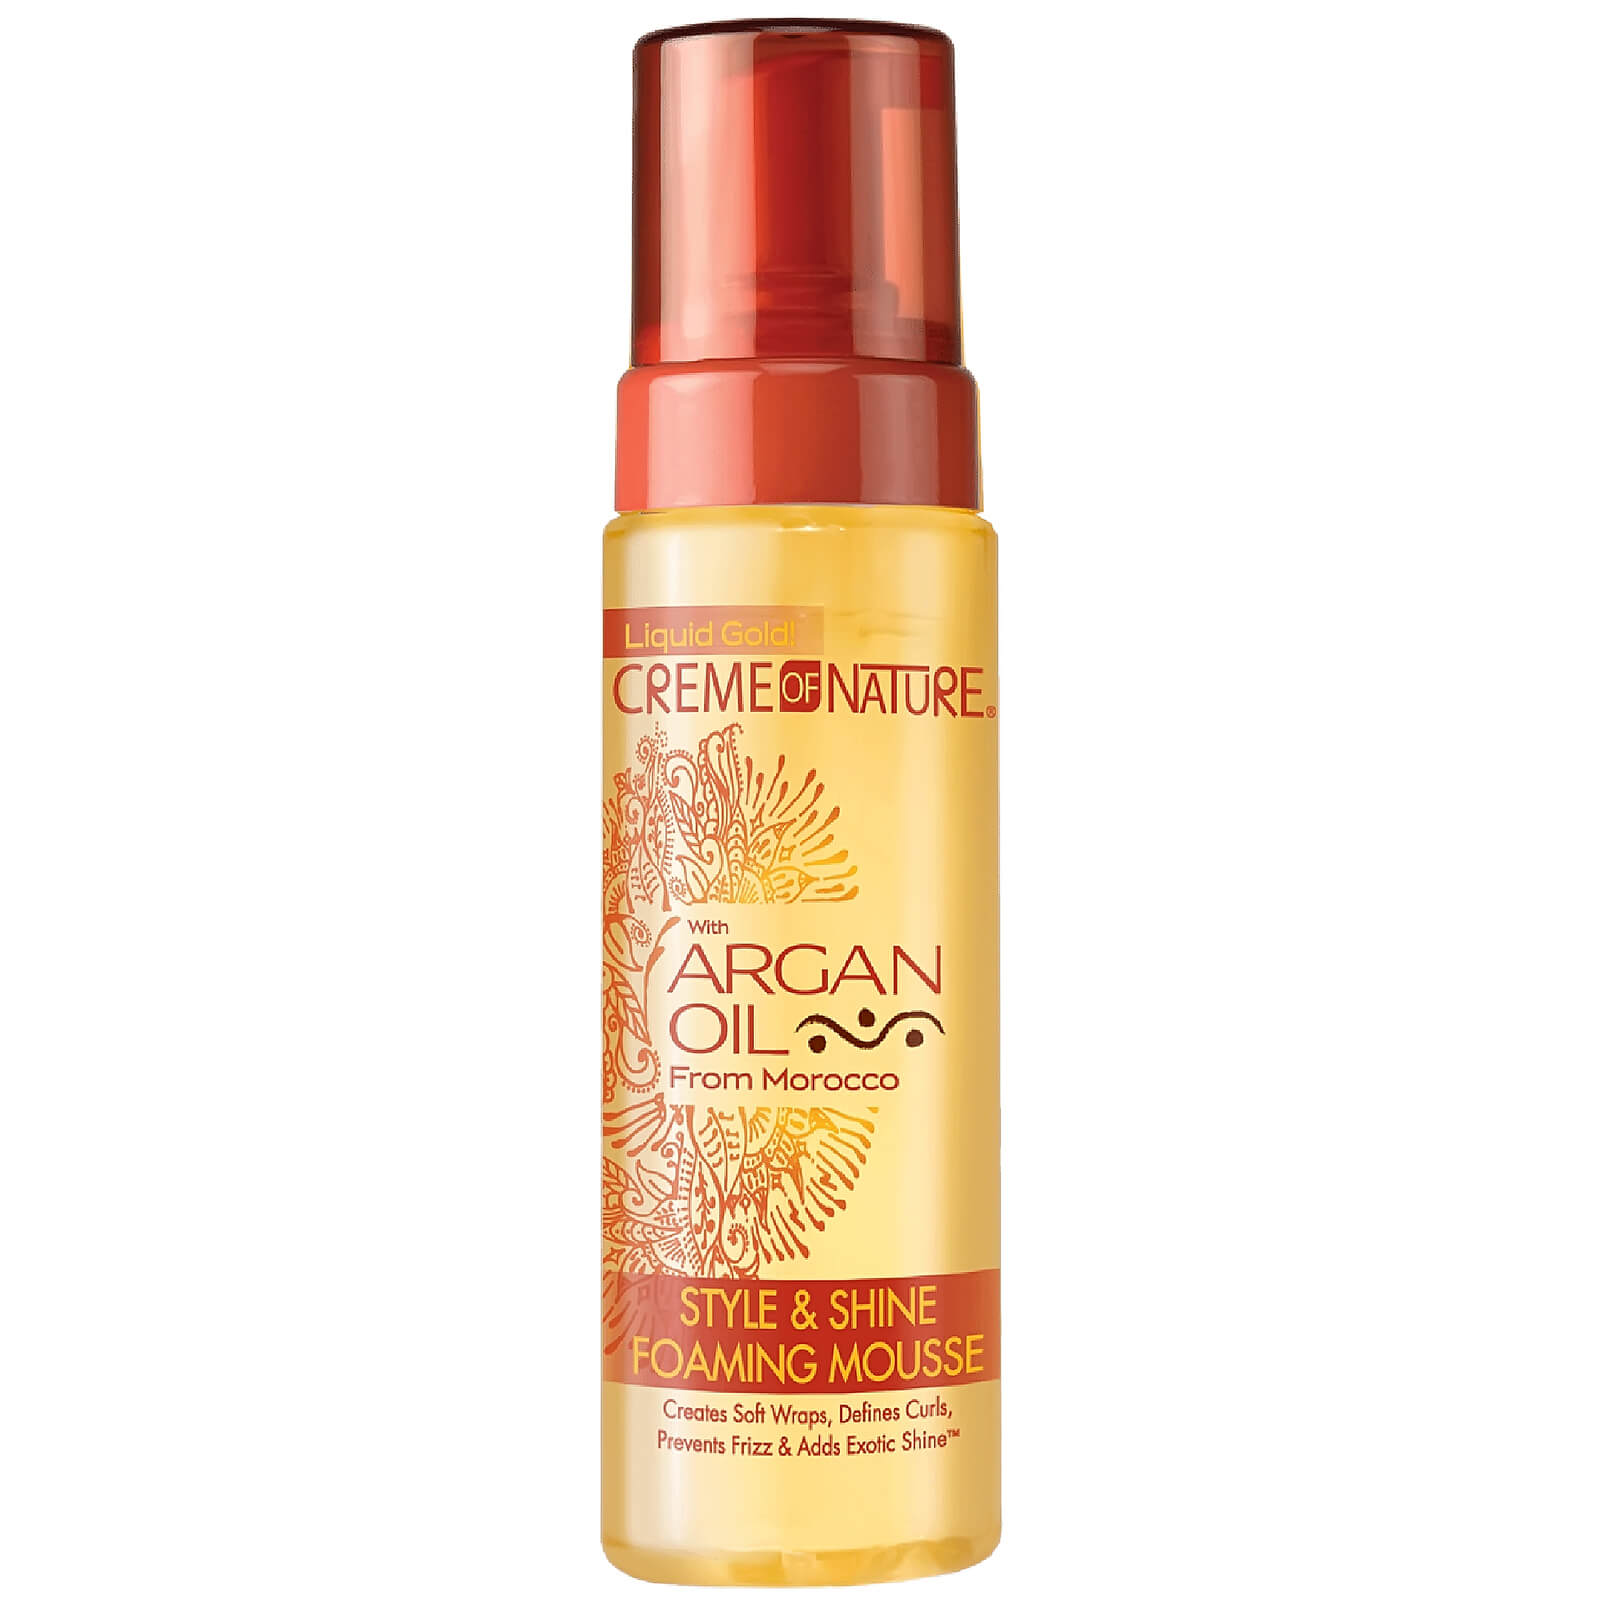 Купить Crème of Nature Argan Oil Style & Shine Foaming Mousse 207ml